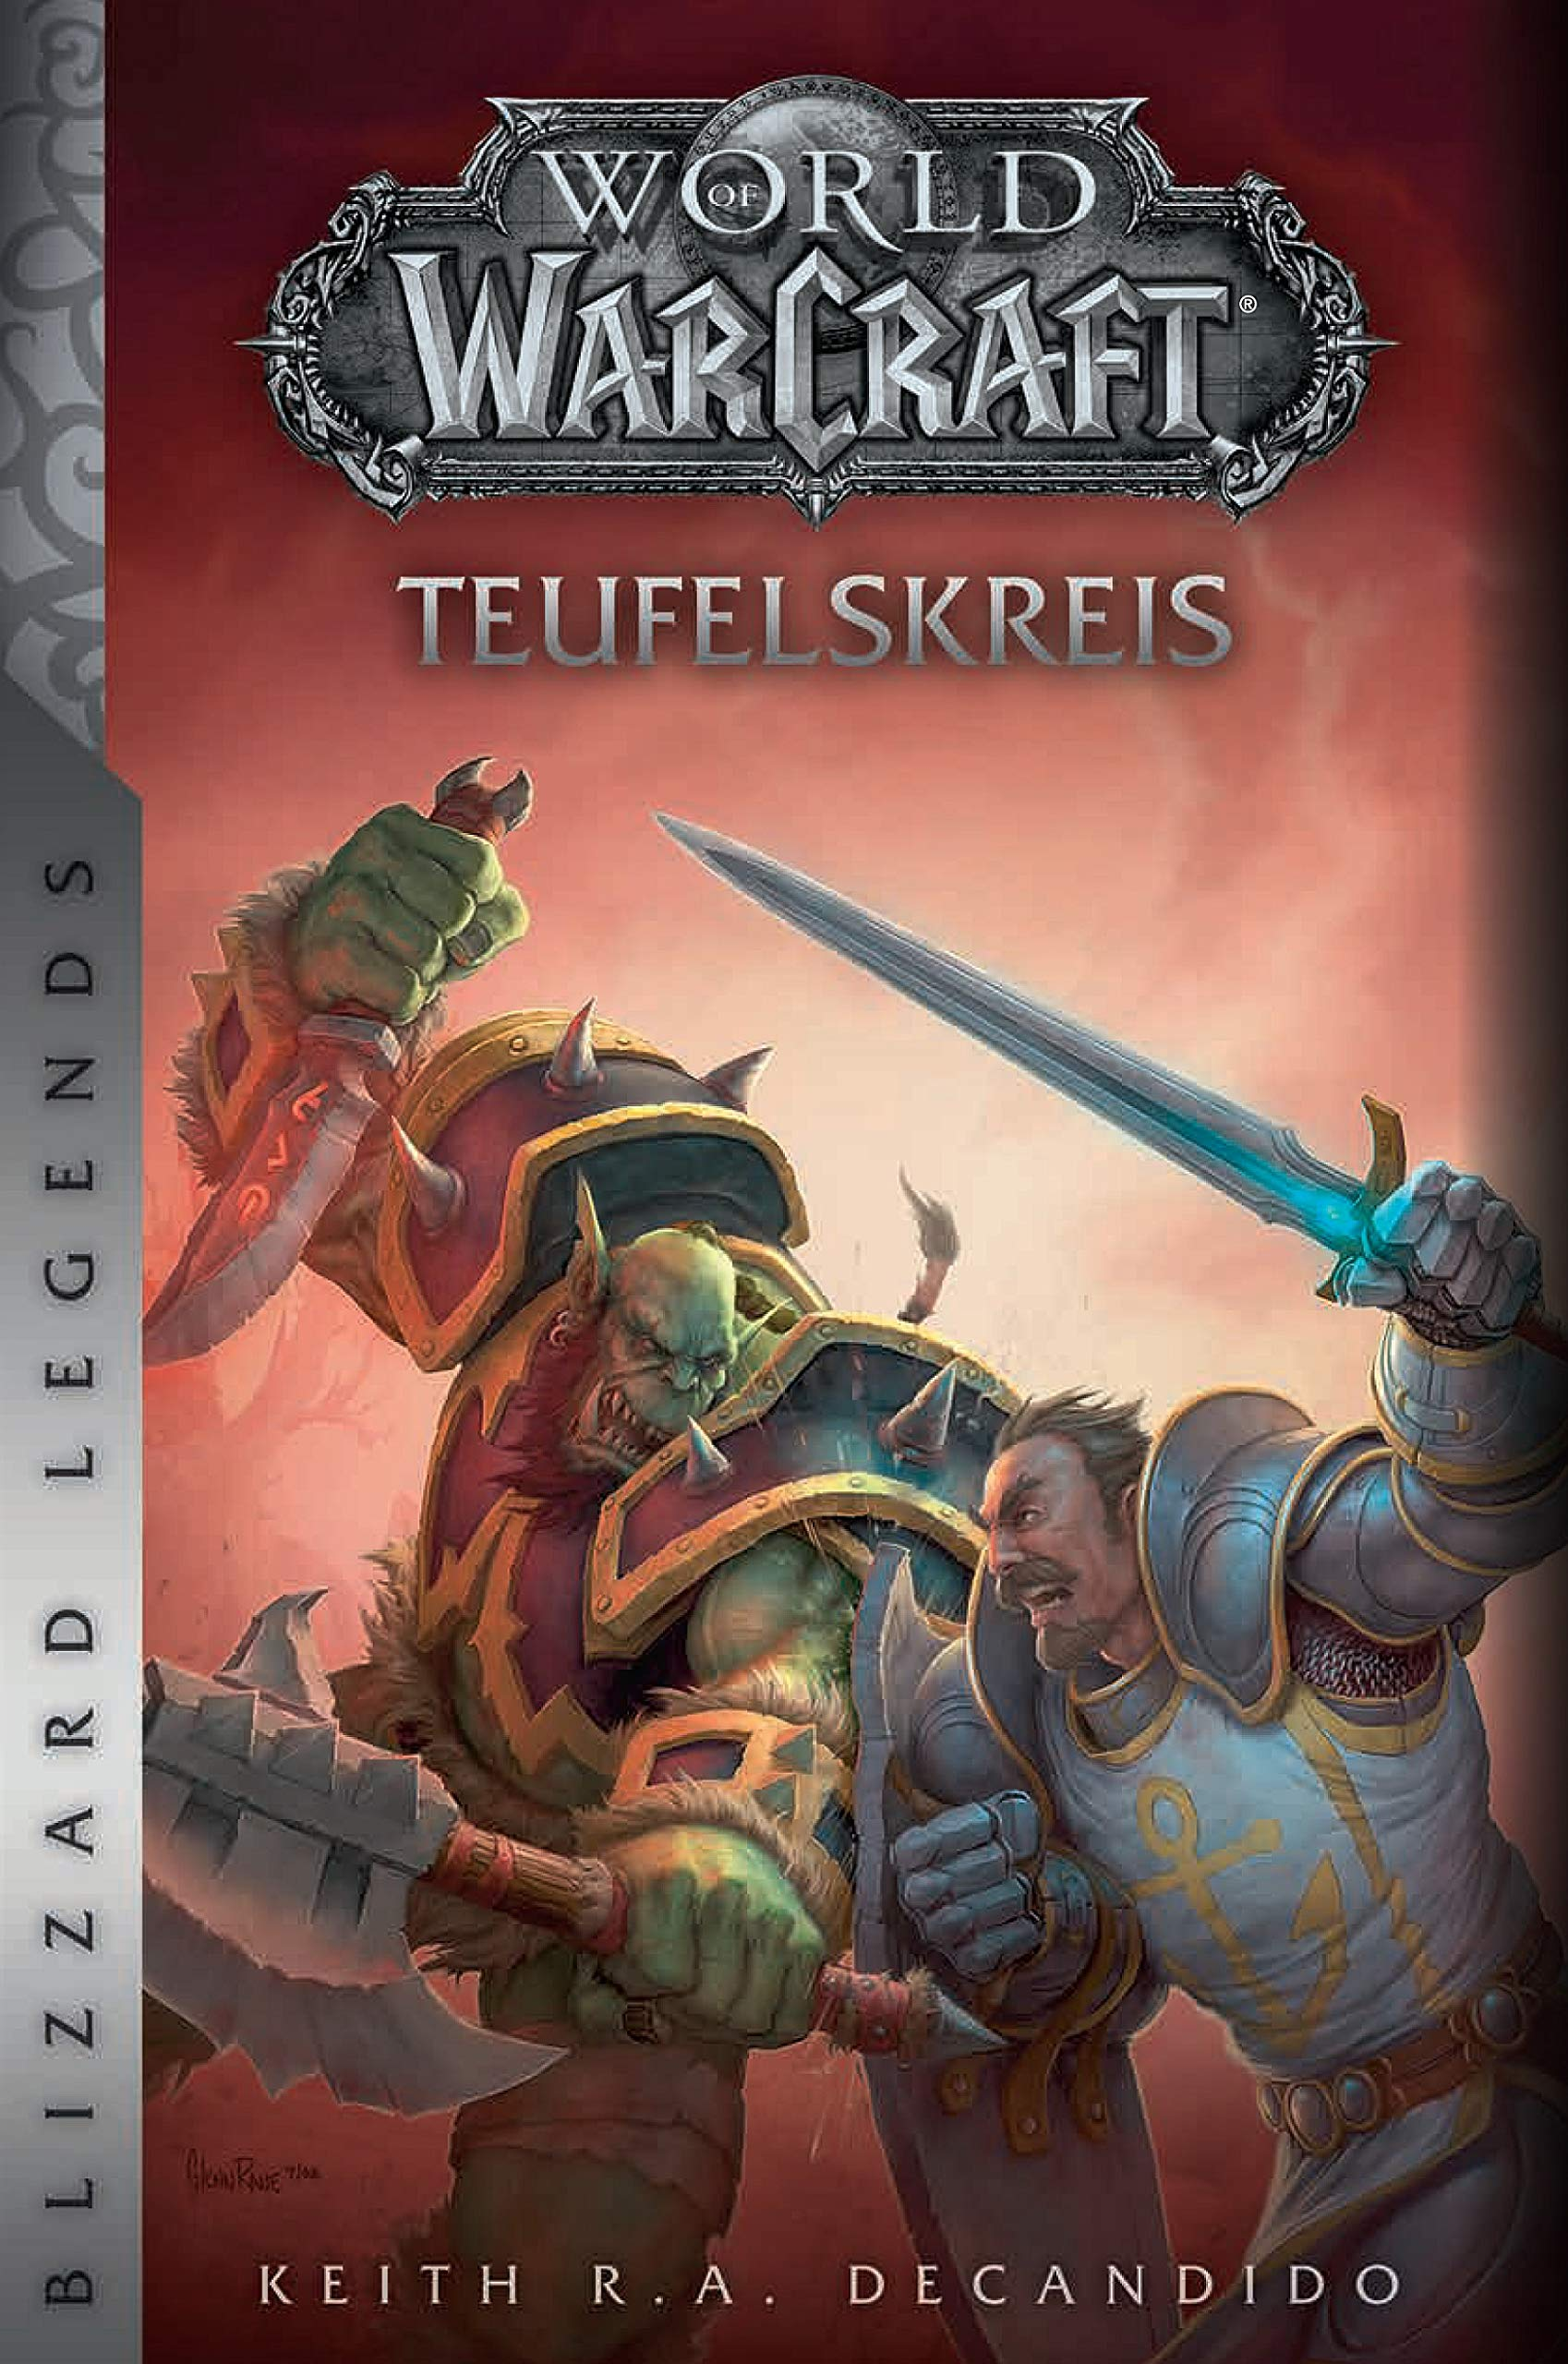 World Of Warcraft Teufelskreis Blizzard Legends Amazonde